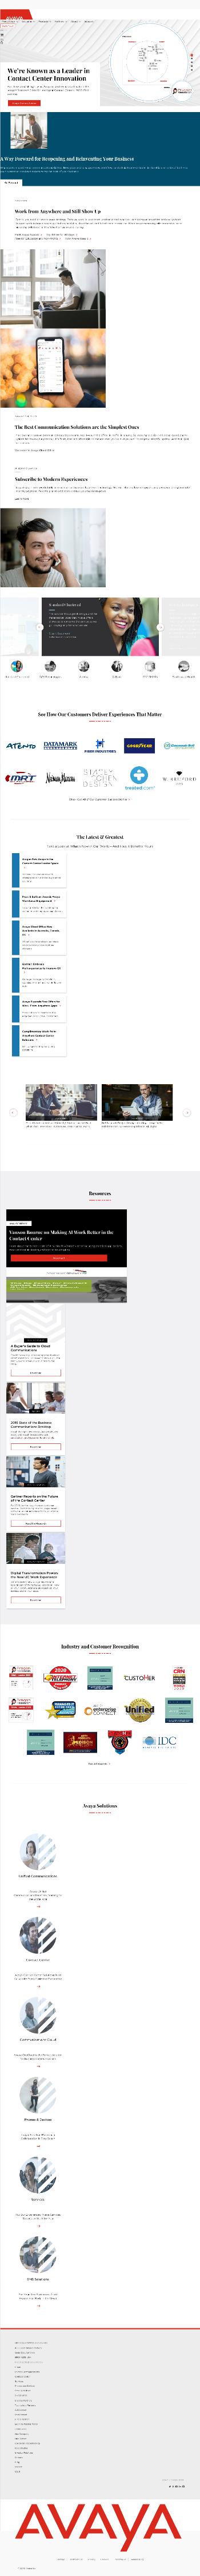 Avaya Holdings Corp. Website Screenshot